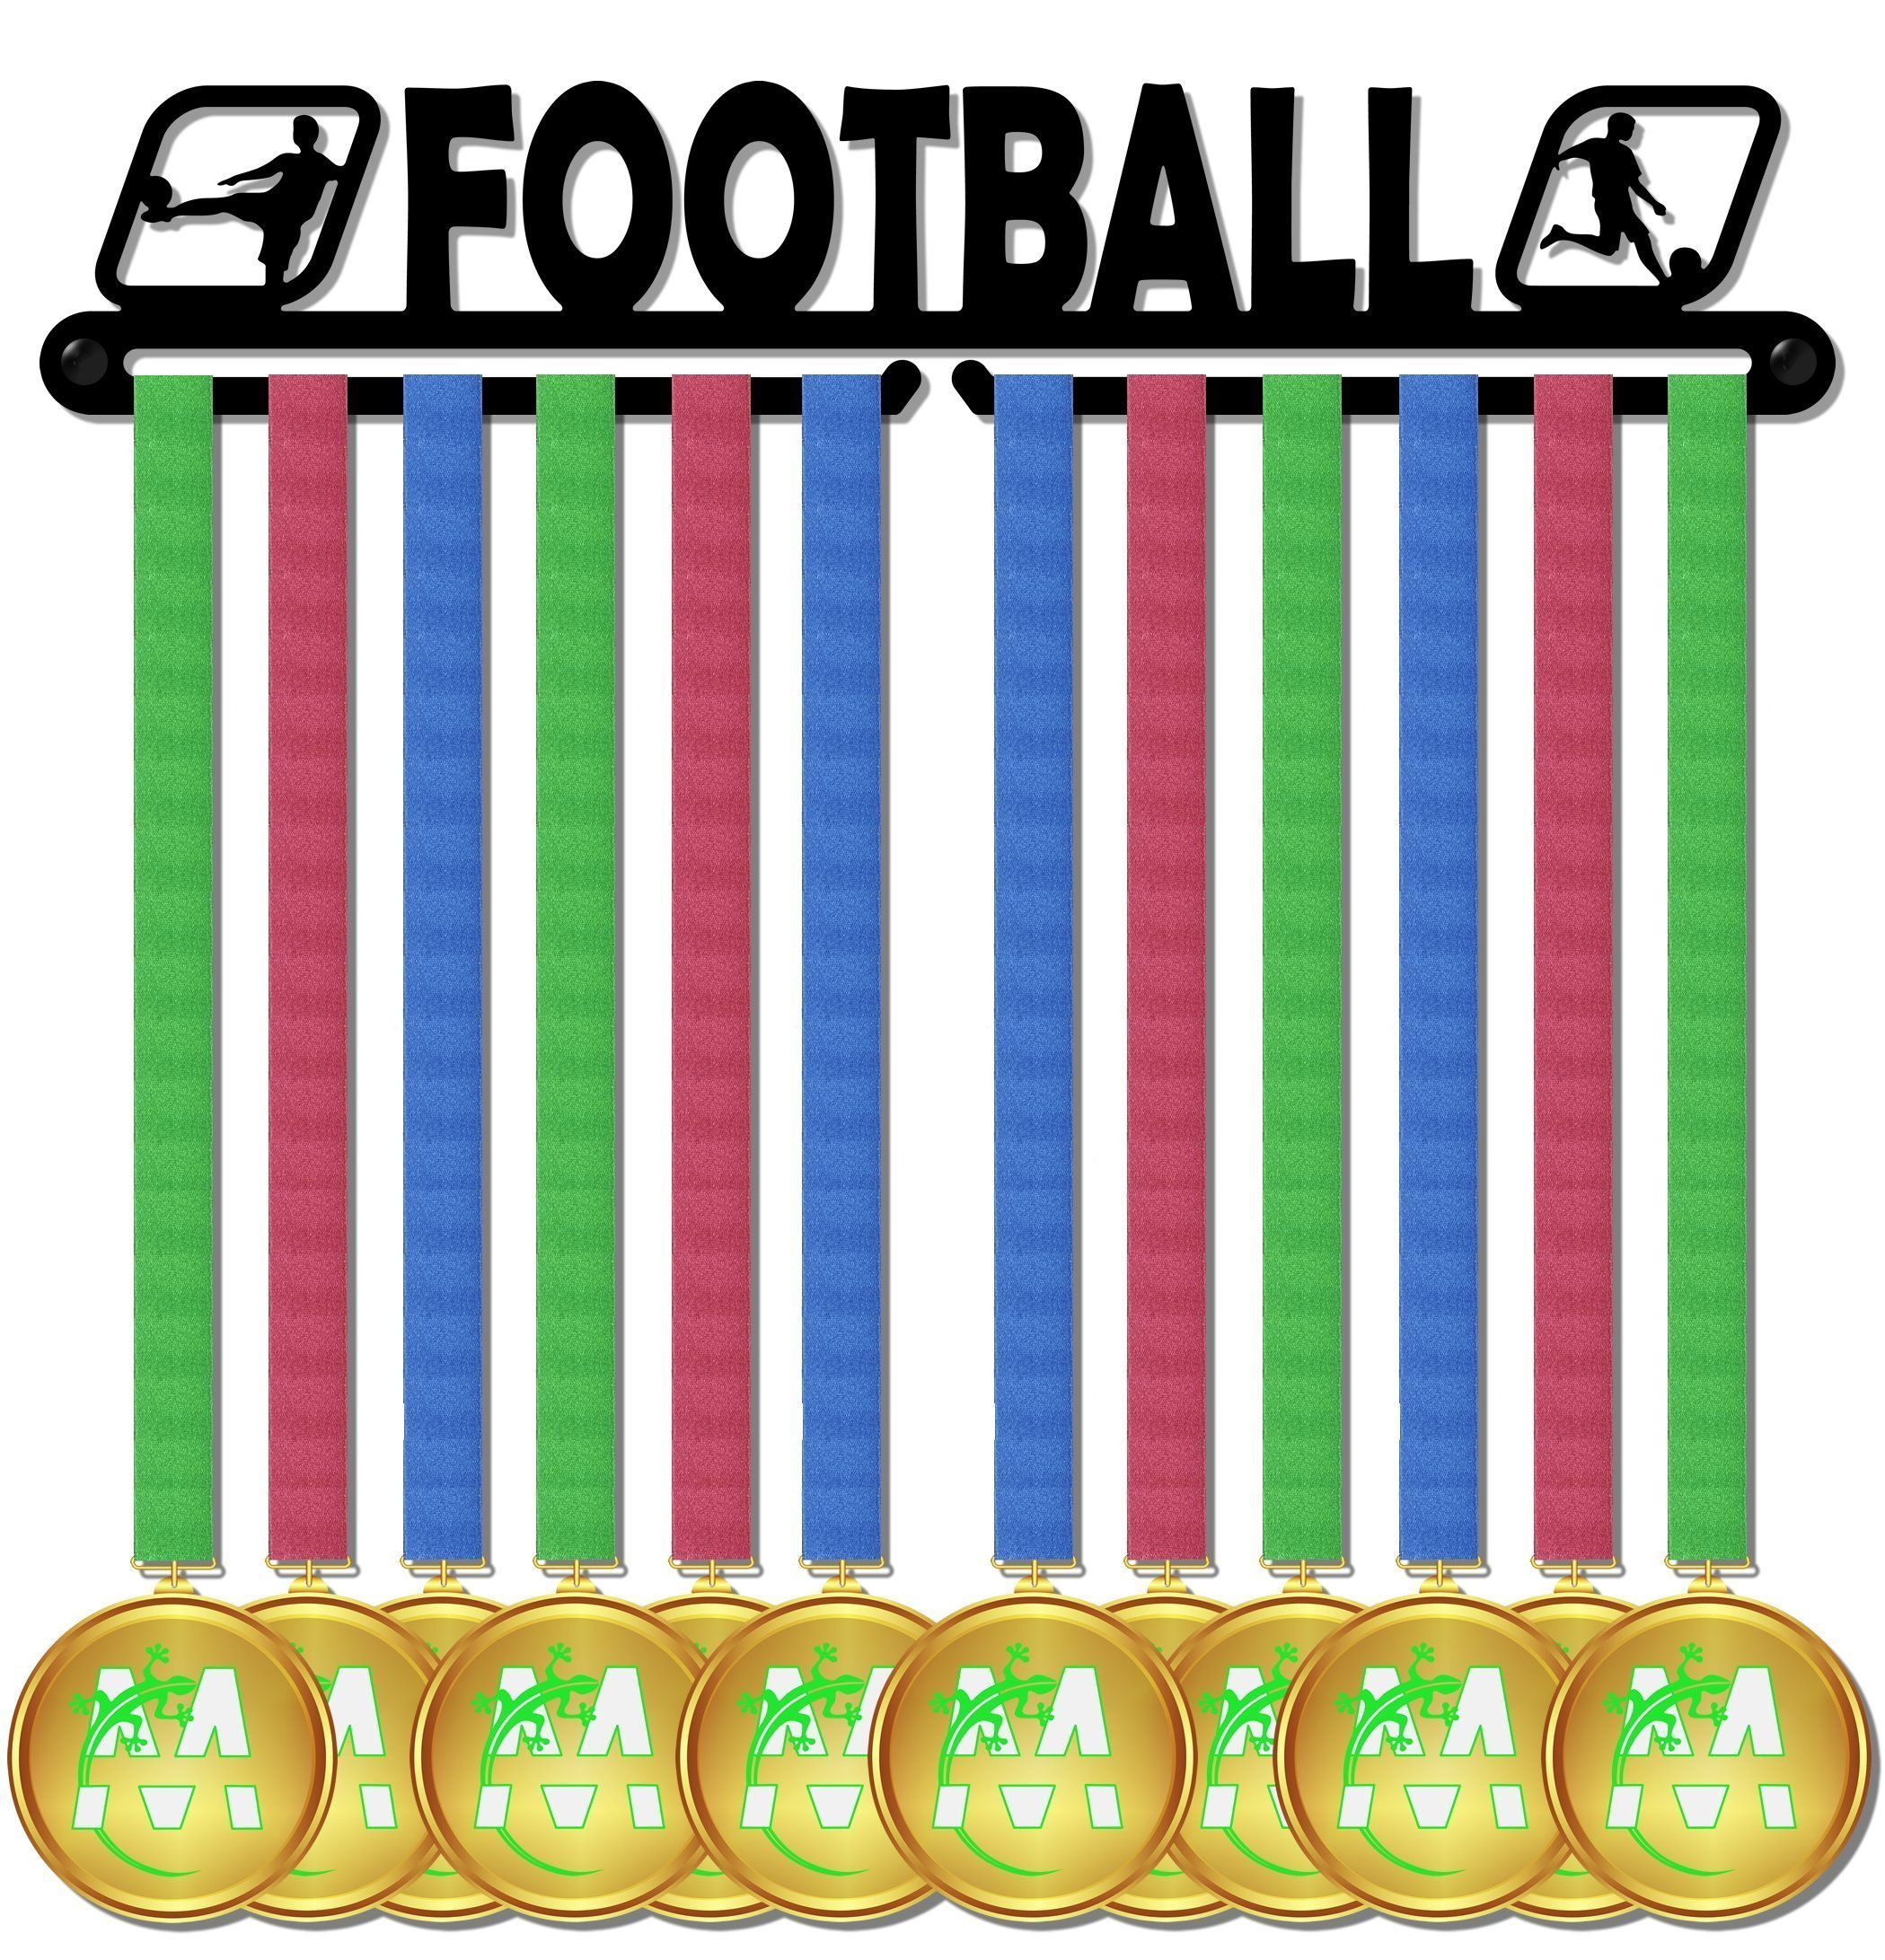 Medal Display medagliere da muro madal hanger football design